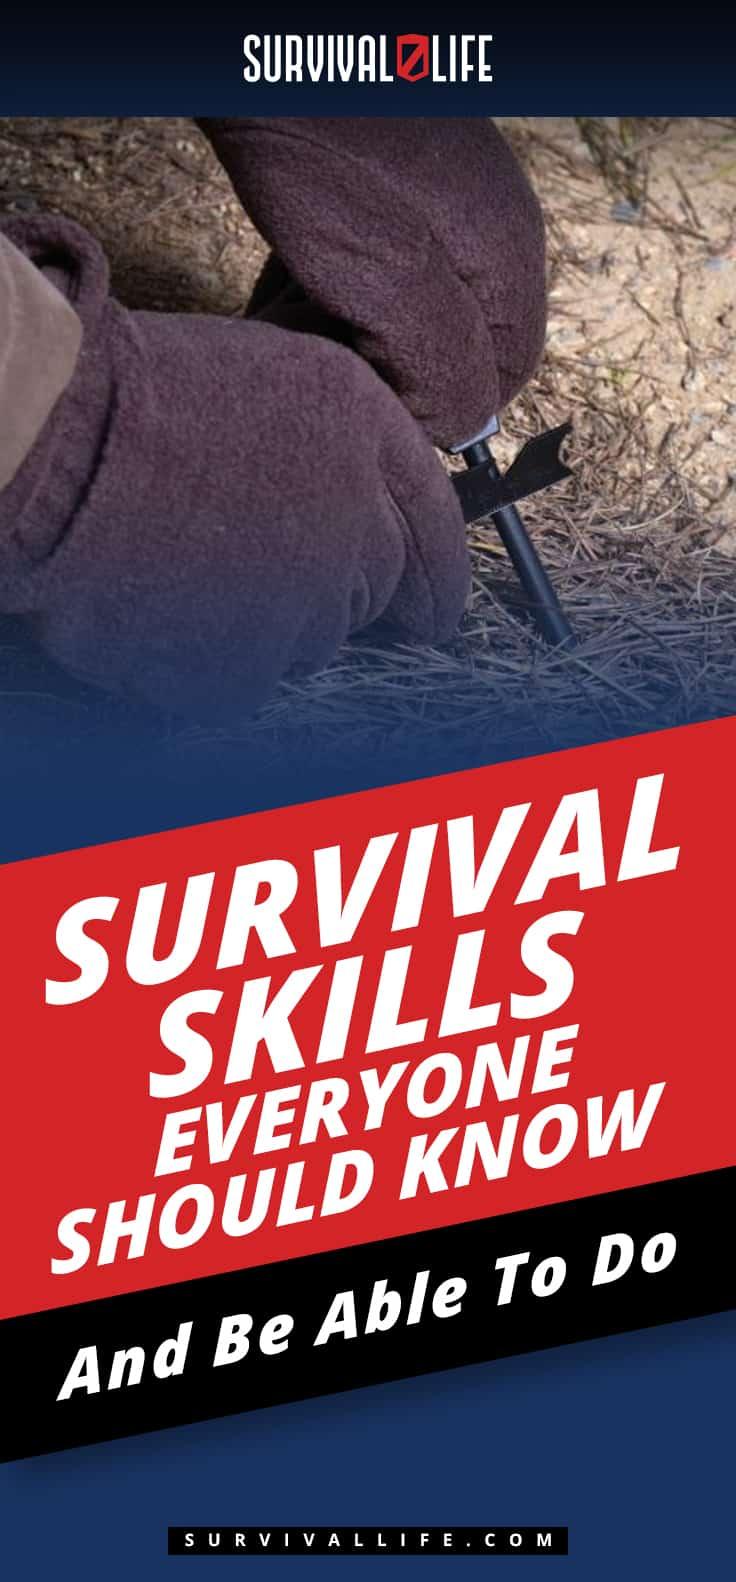 Placard | Survival Skills Everyone Should Know And Be Able To Do | Survival Skills Everyone Should Know